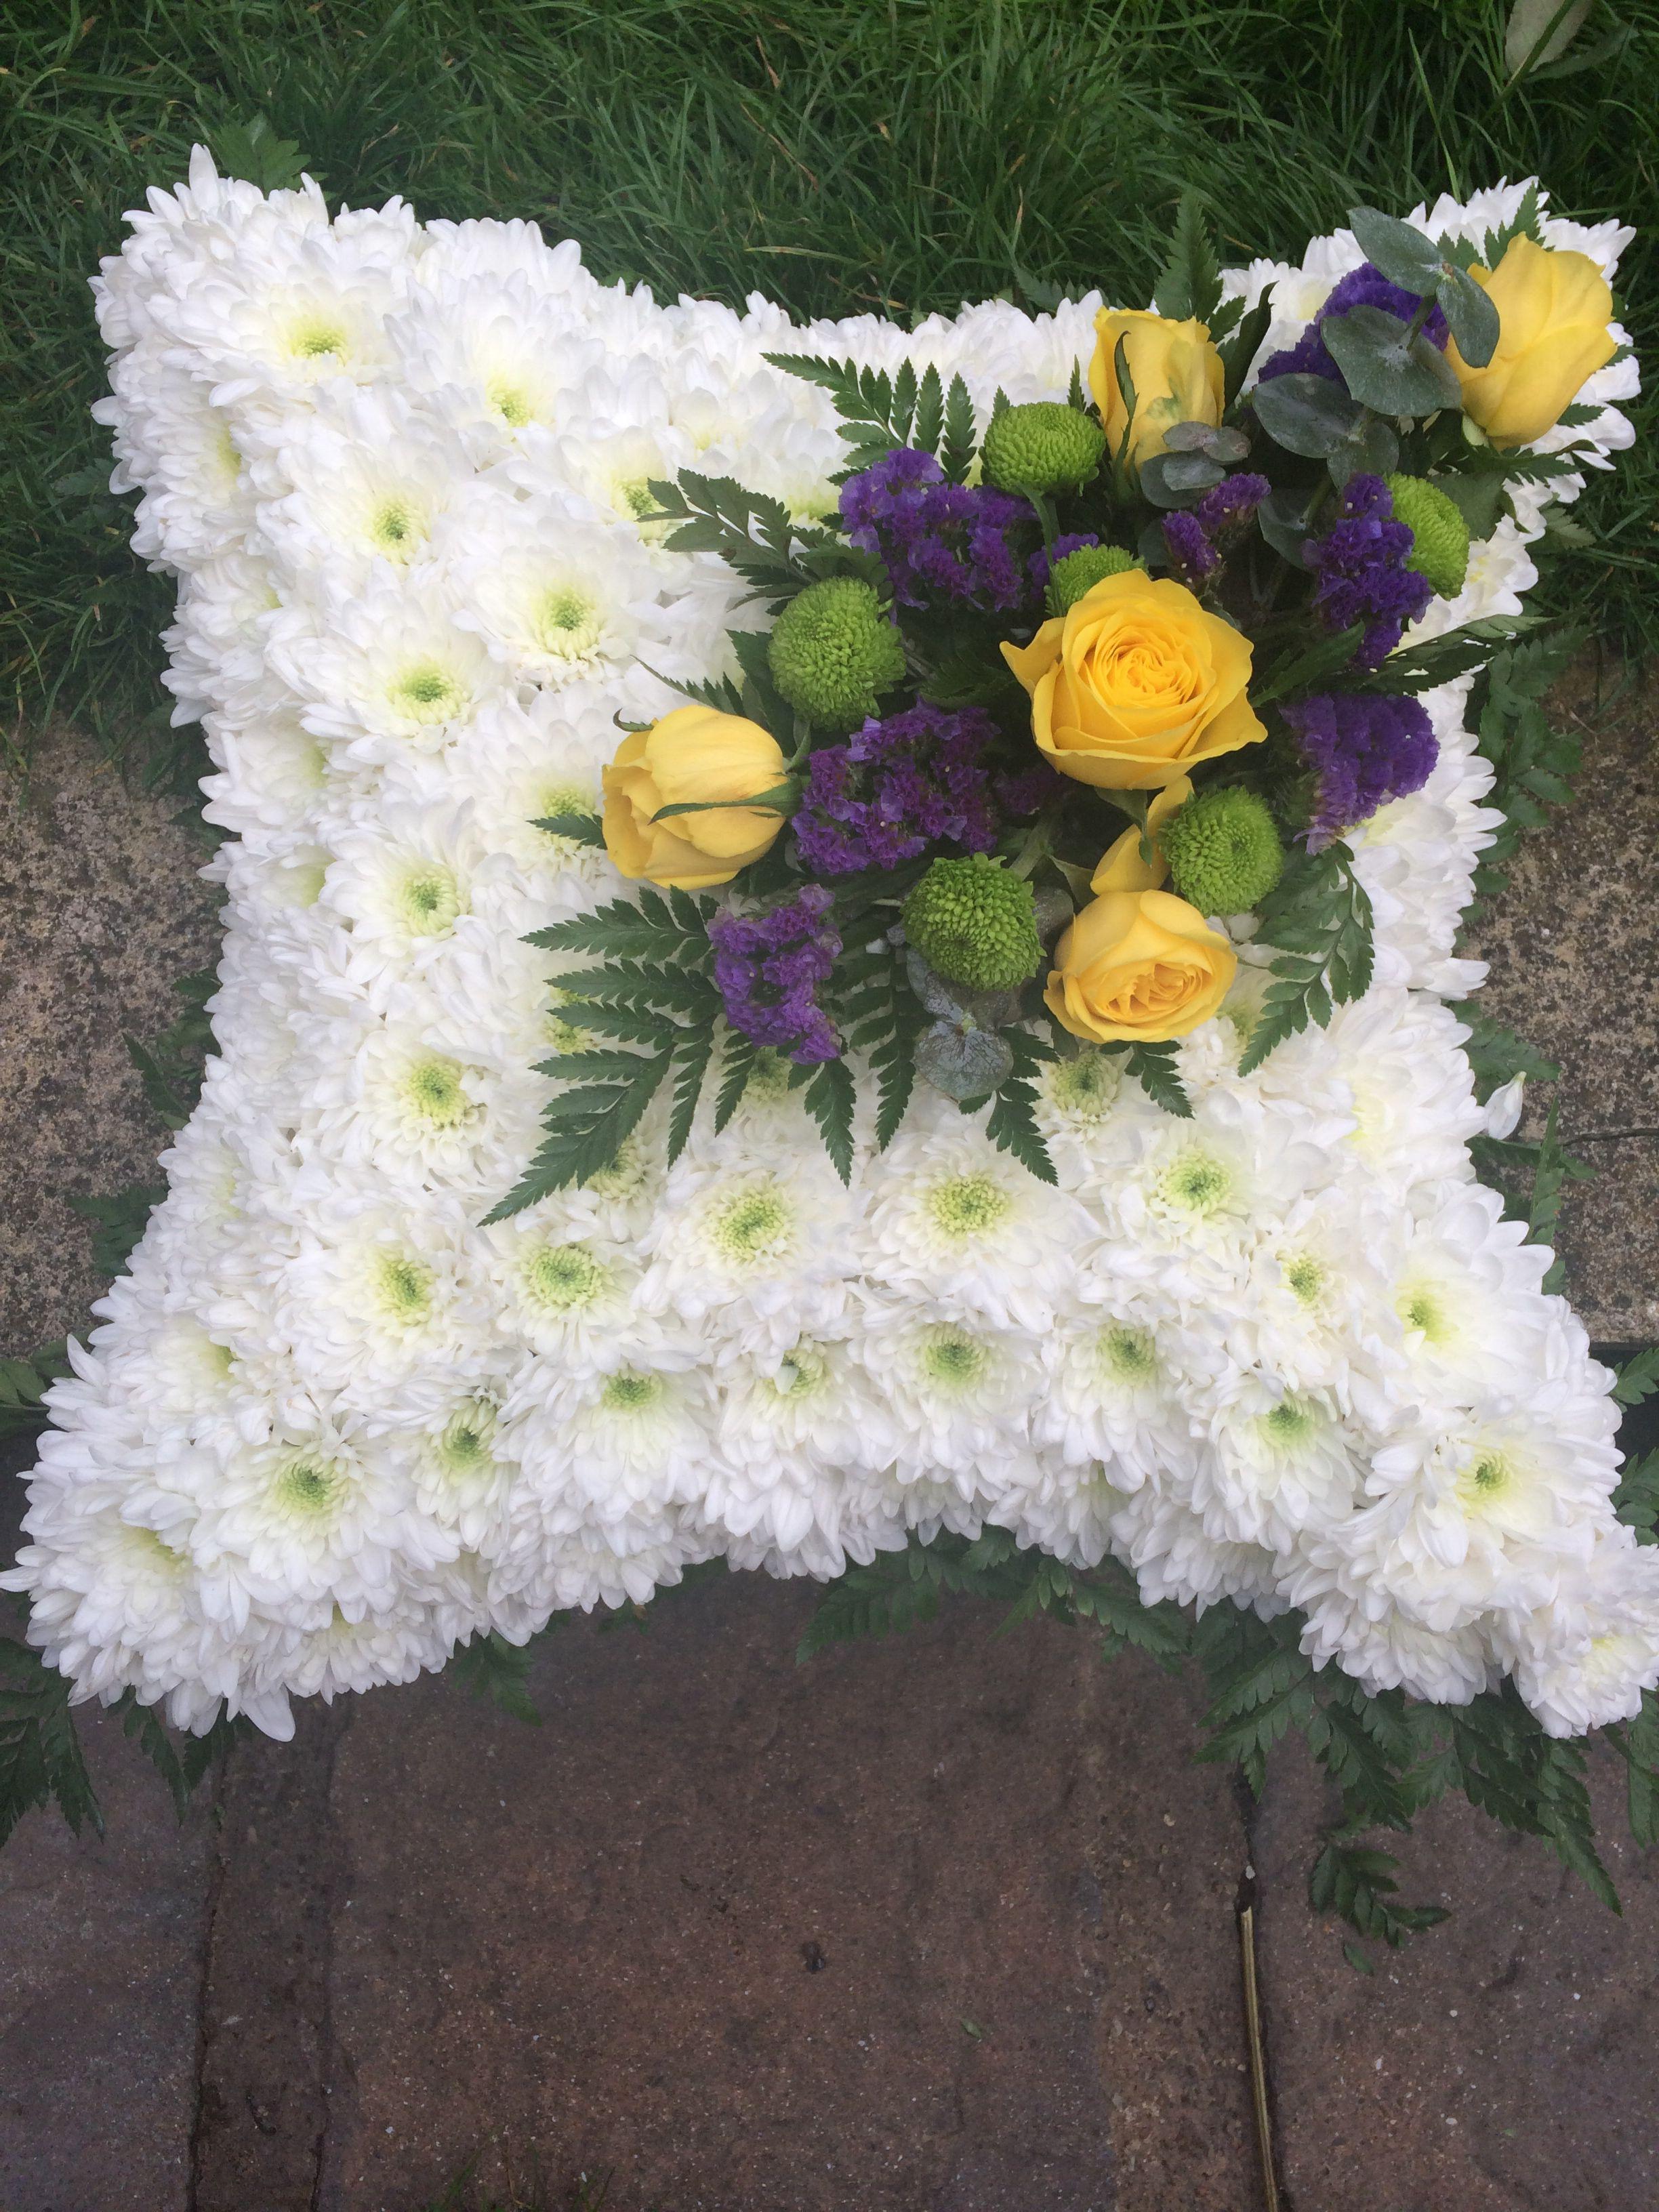 Funeral Design Cushion Funeral Arrangements Pinterest Funeral